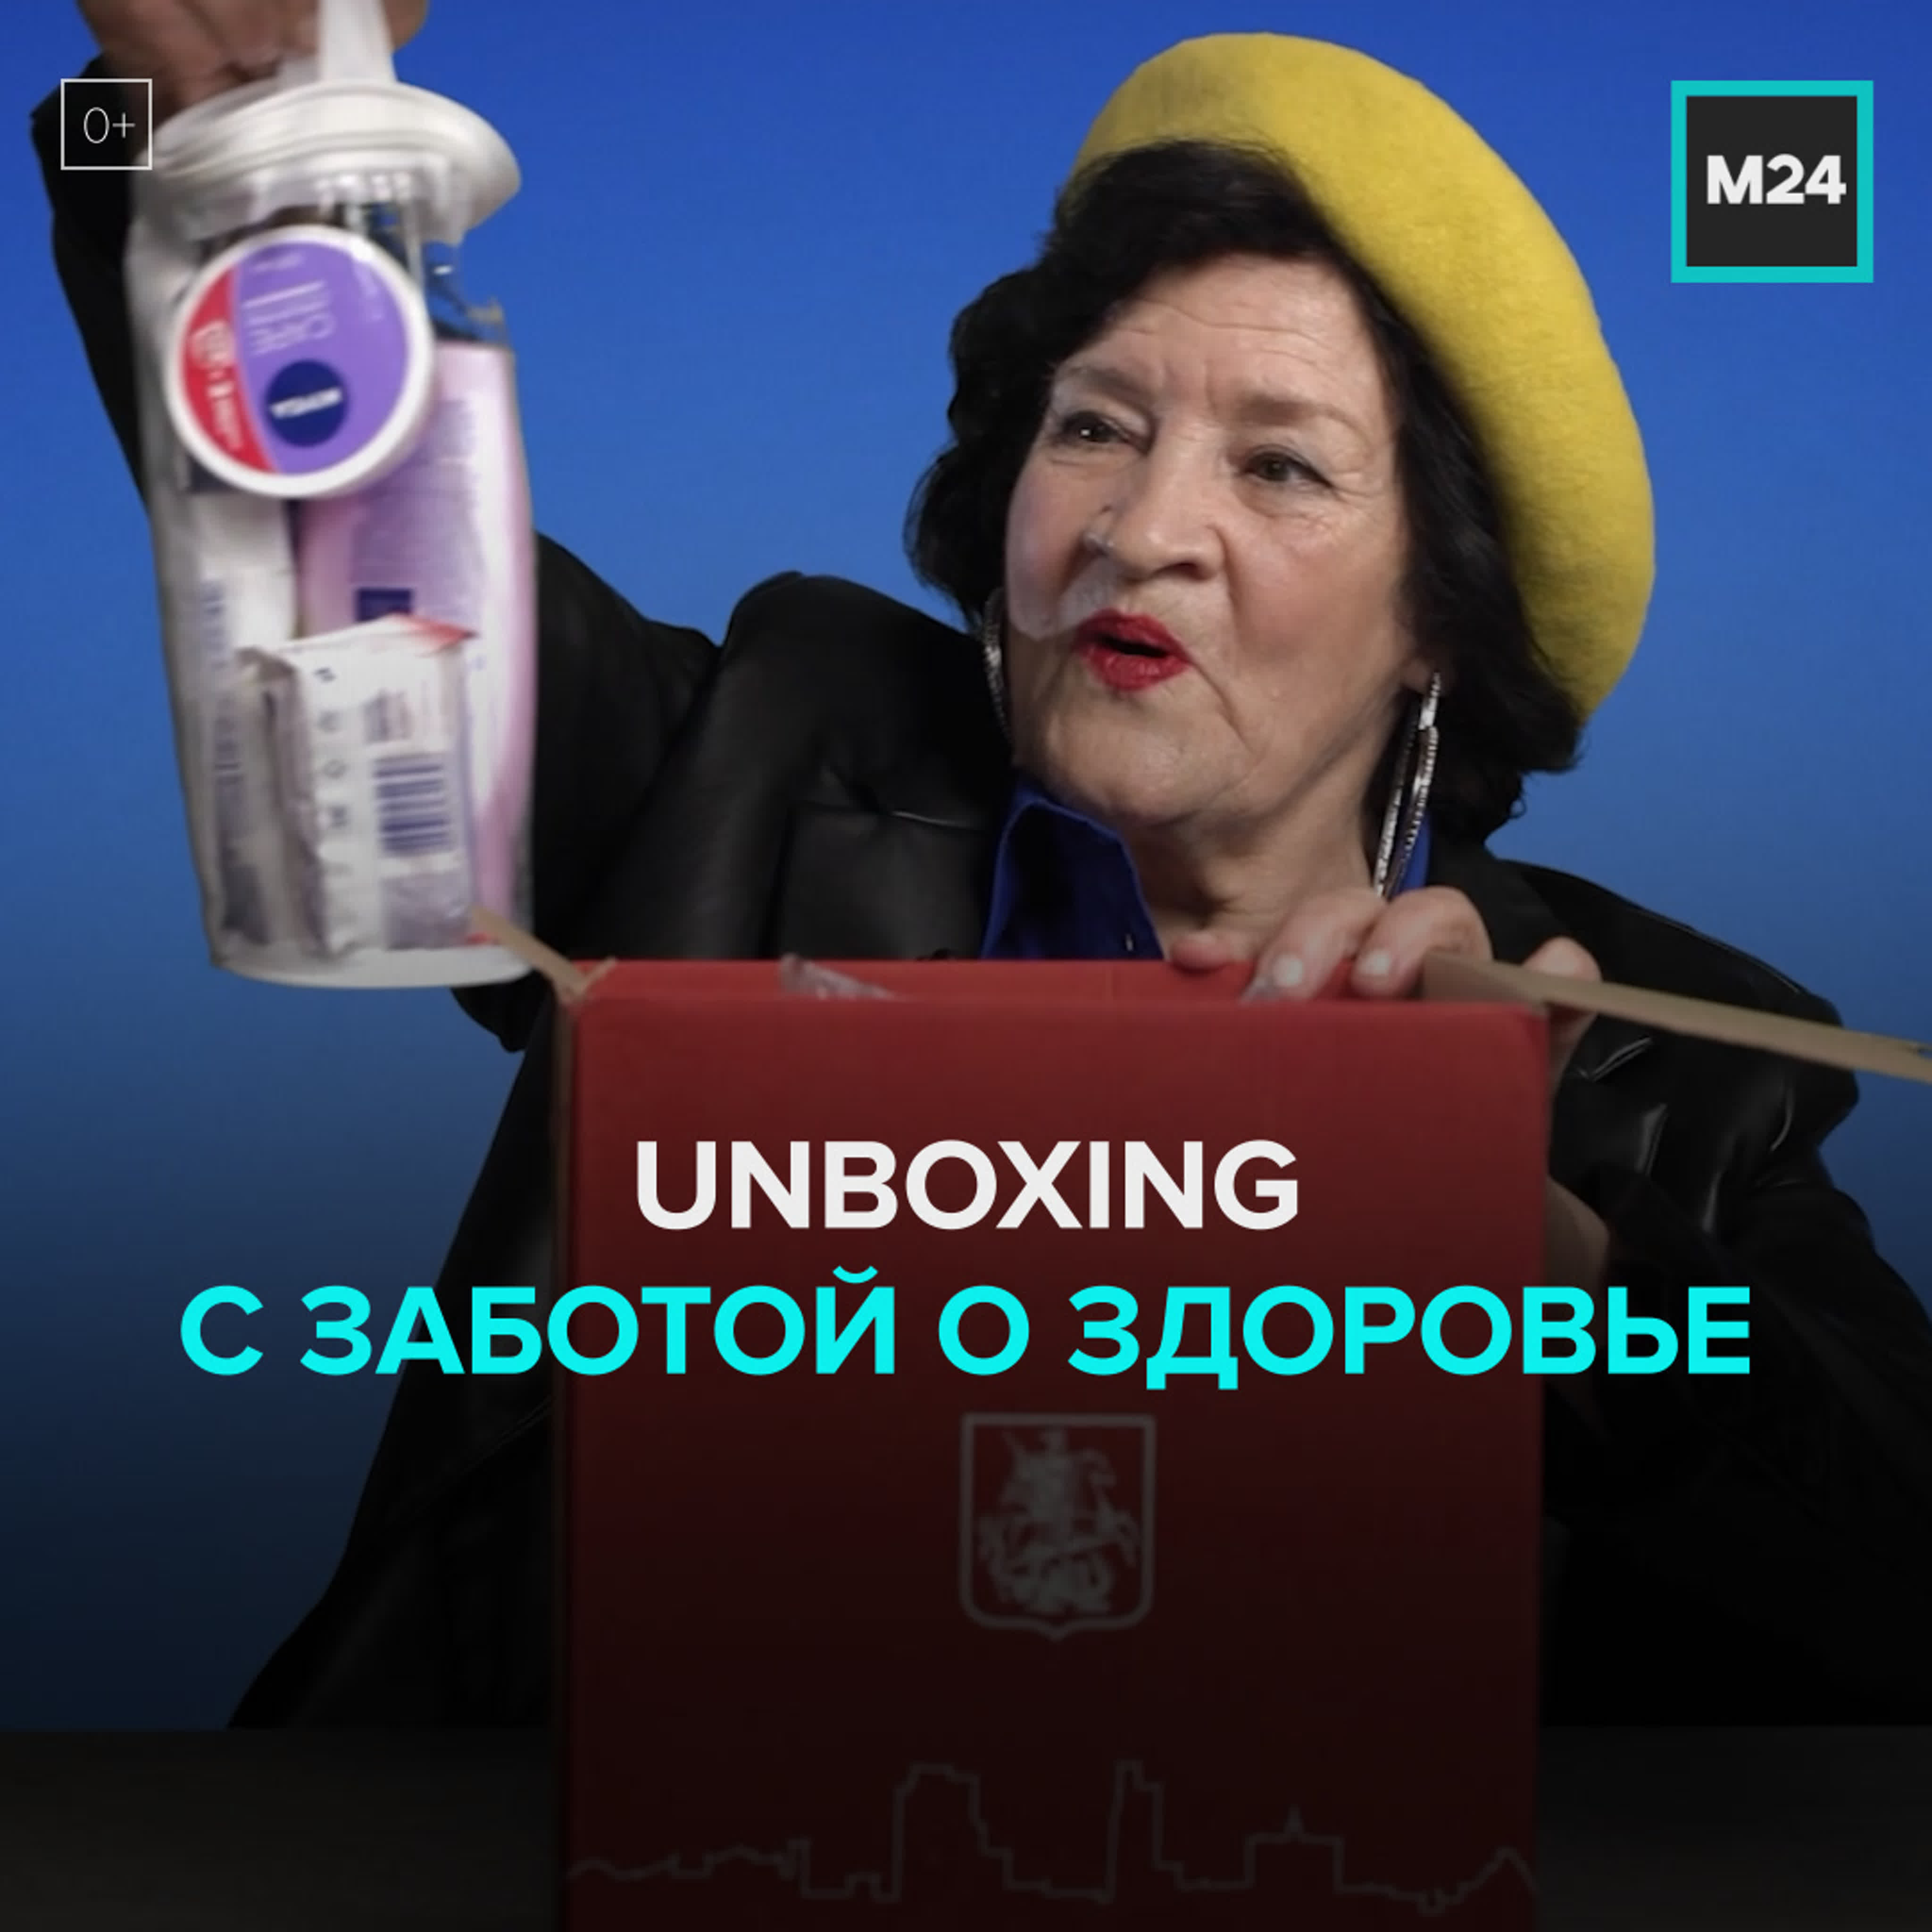 Распаковка по-московски.